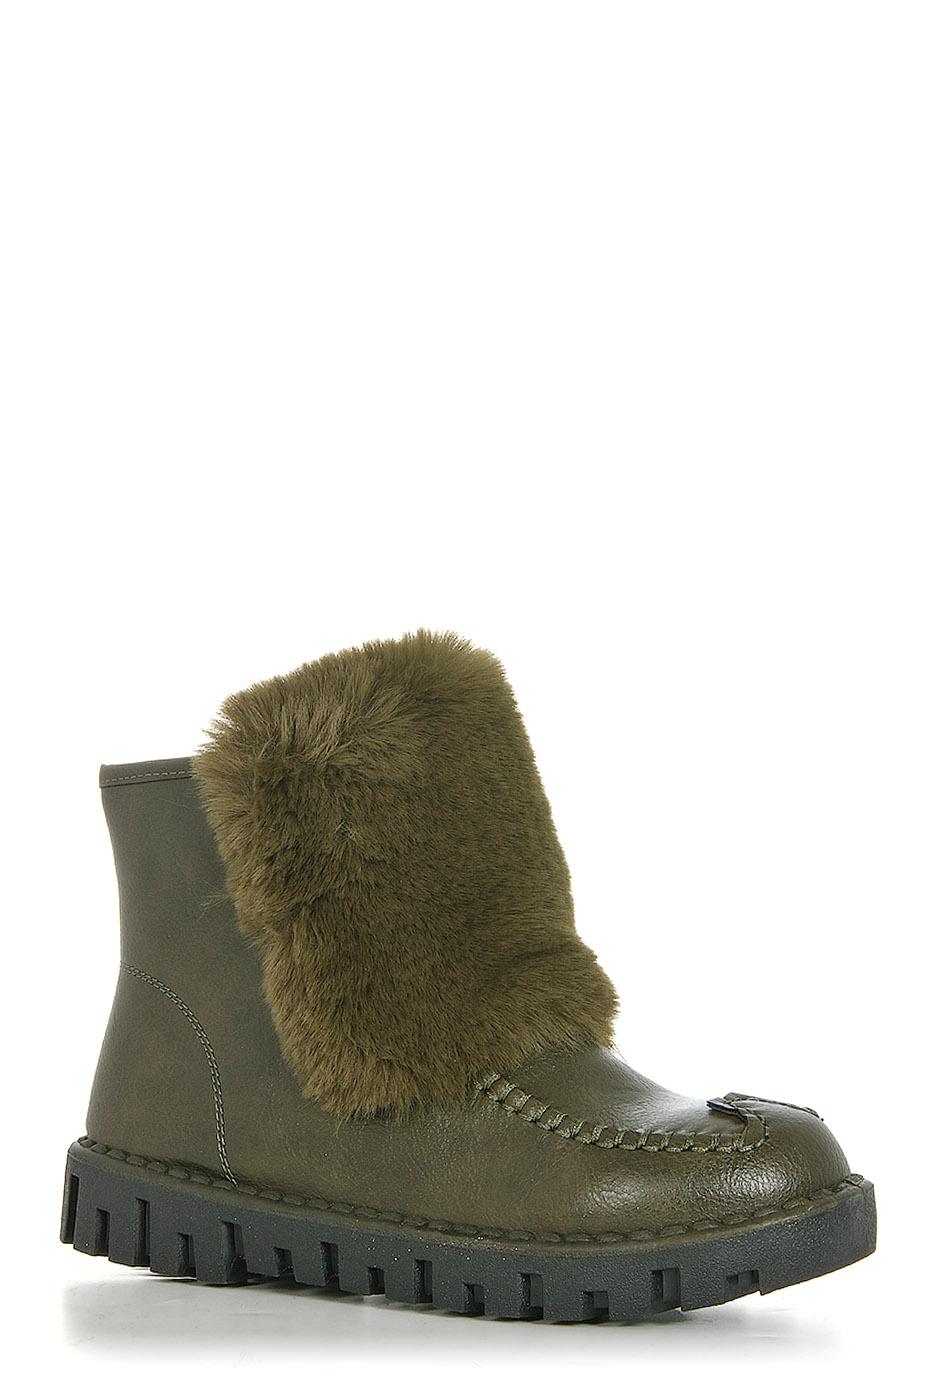 Ботинки TOPLAND2322-PB76269X/GREEN